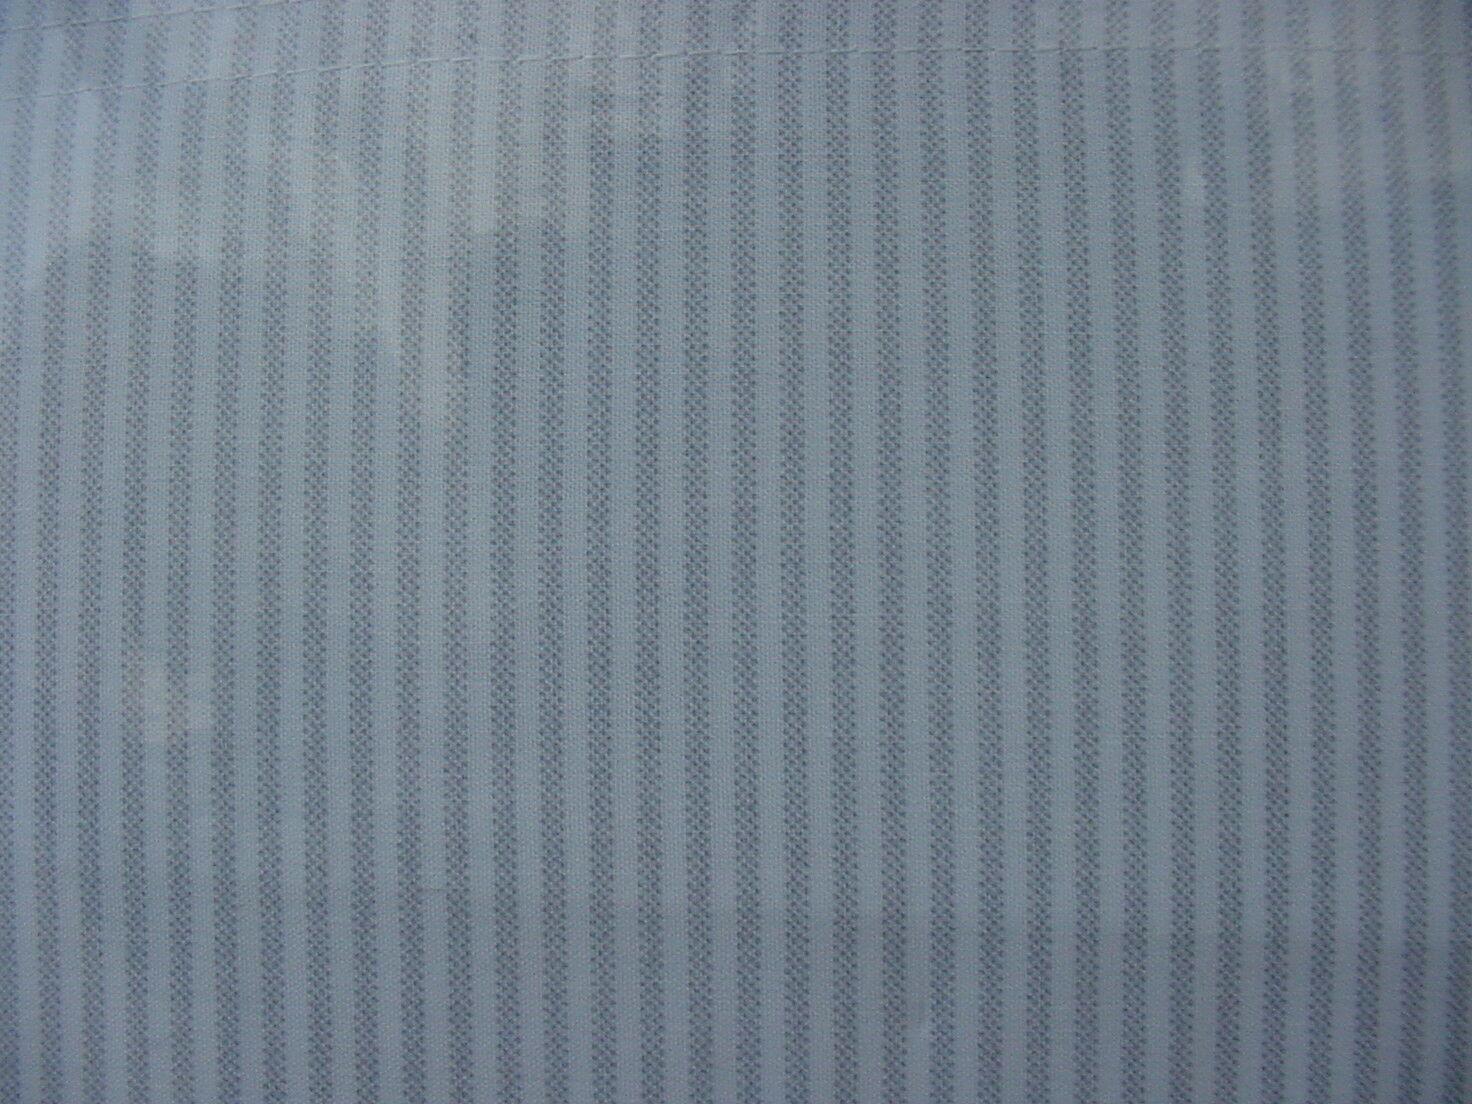 Tommy Hilfiger Ithaca Stripe Gray White Sheet Set King